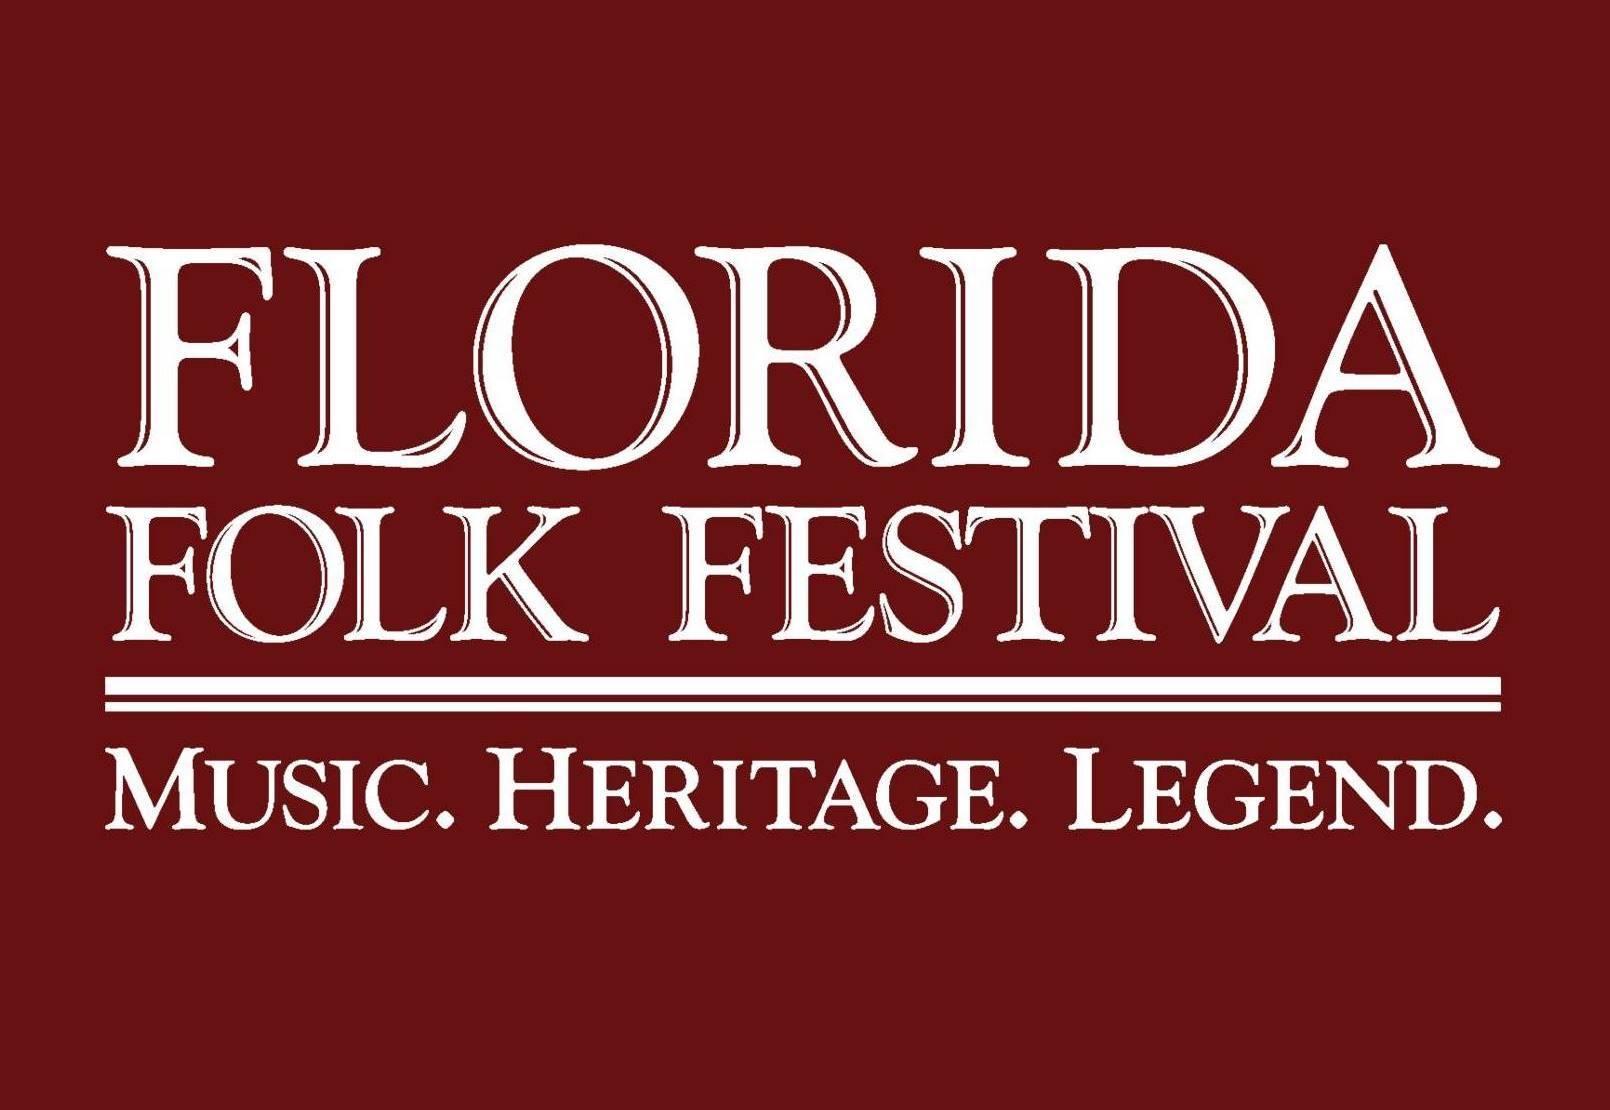 Florida Folk Festivals